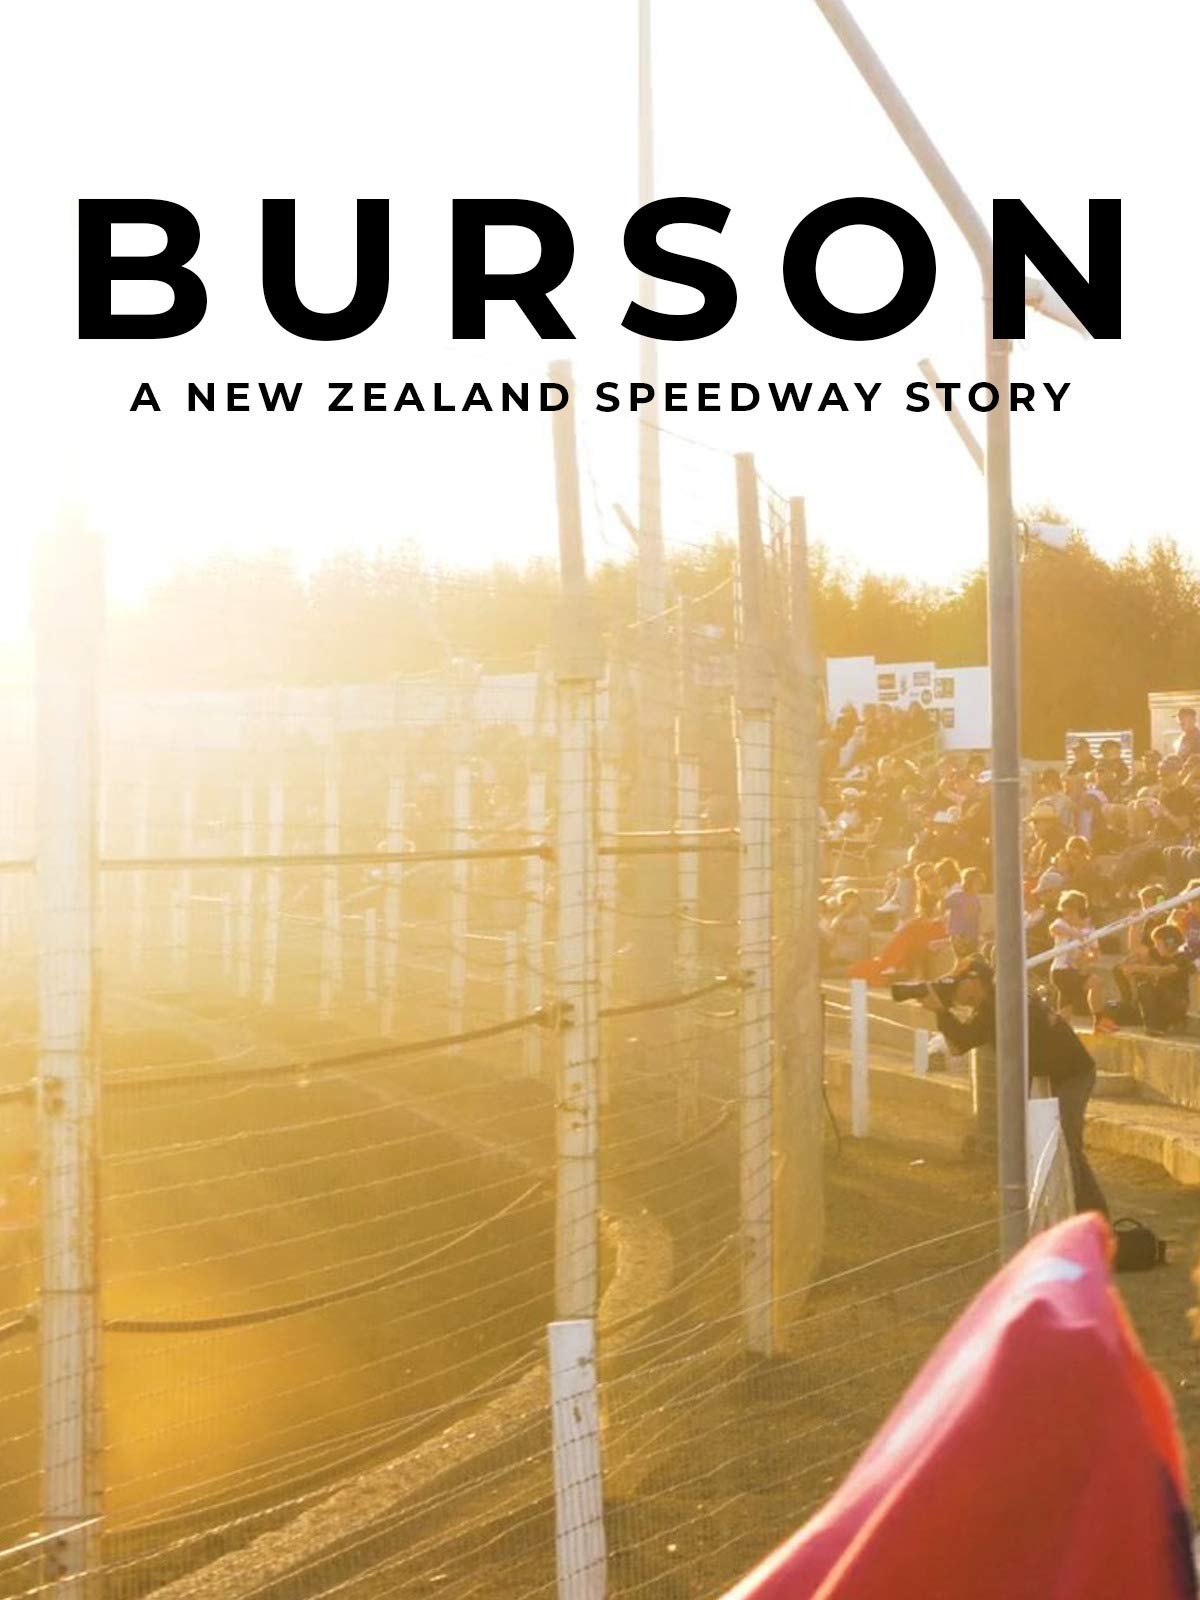 Burson - A new Zealand Speedway Story